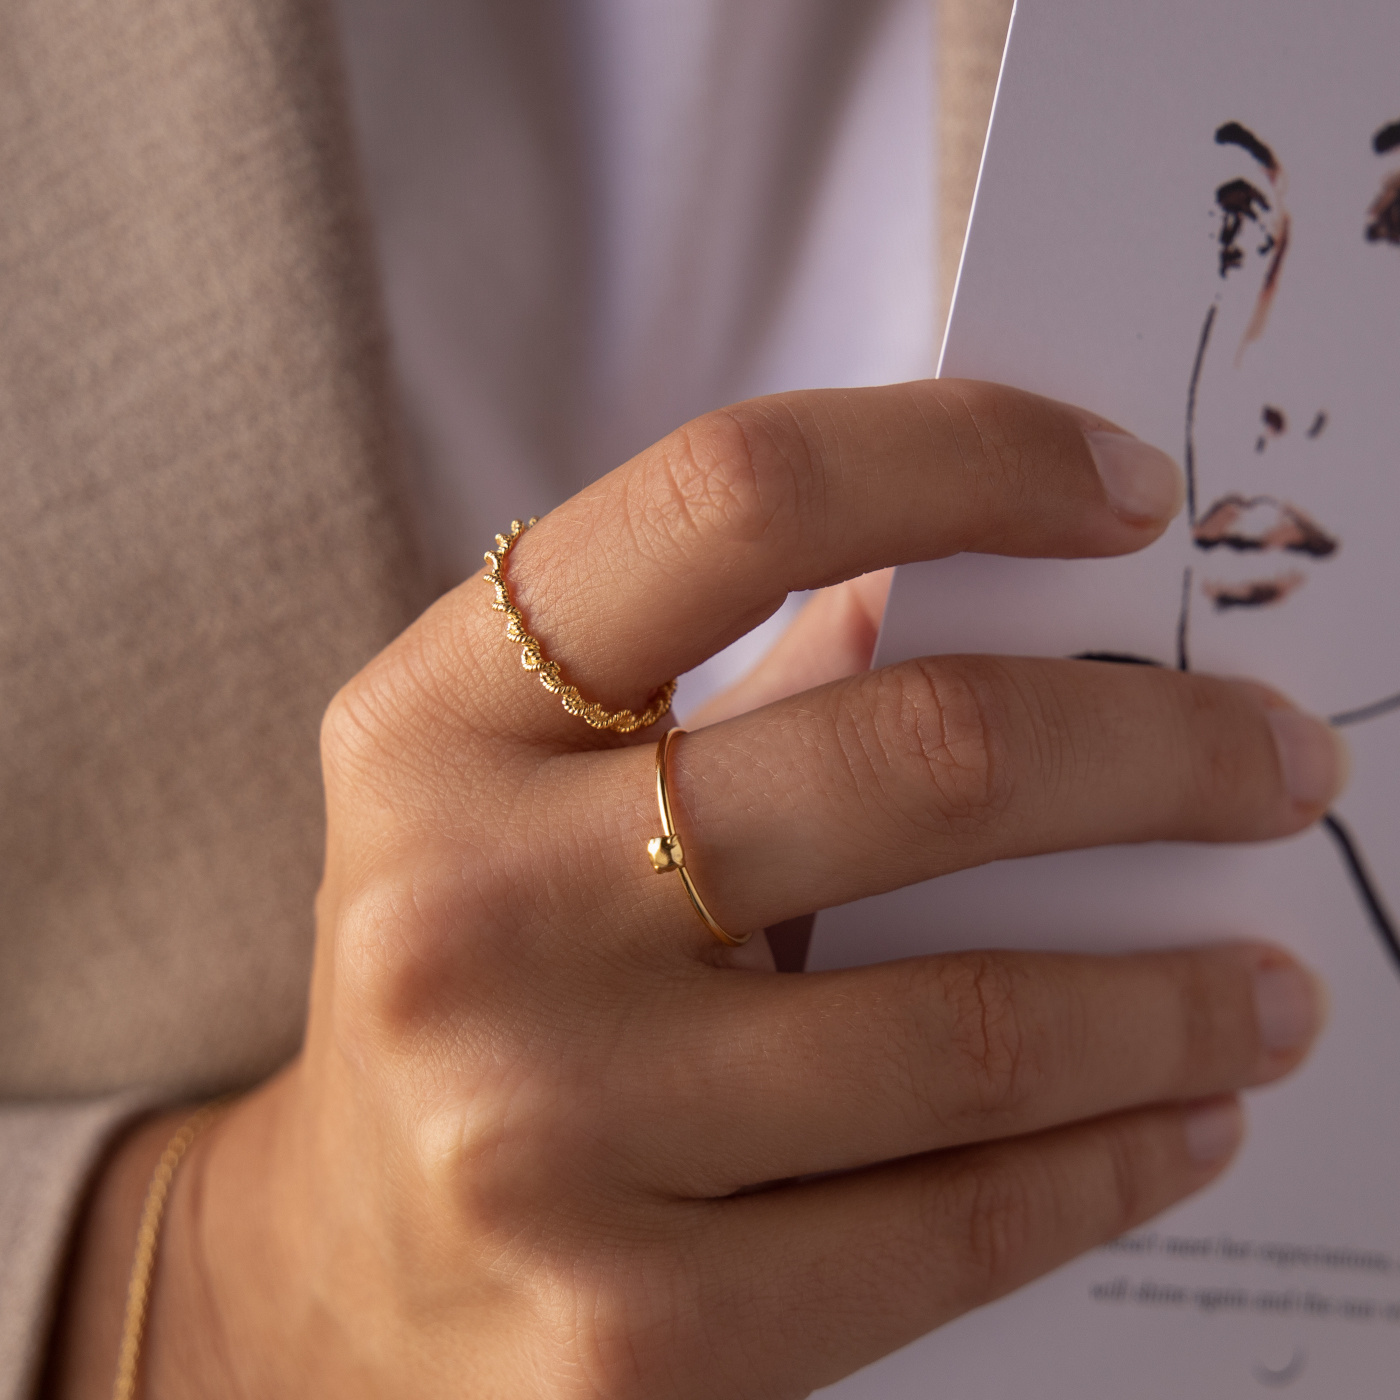 Violet Hamden Goldfarbener geflochtener Sisterhood Ring aus 925 Sterlingsilber